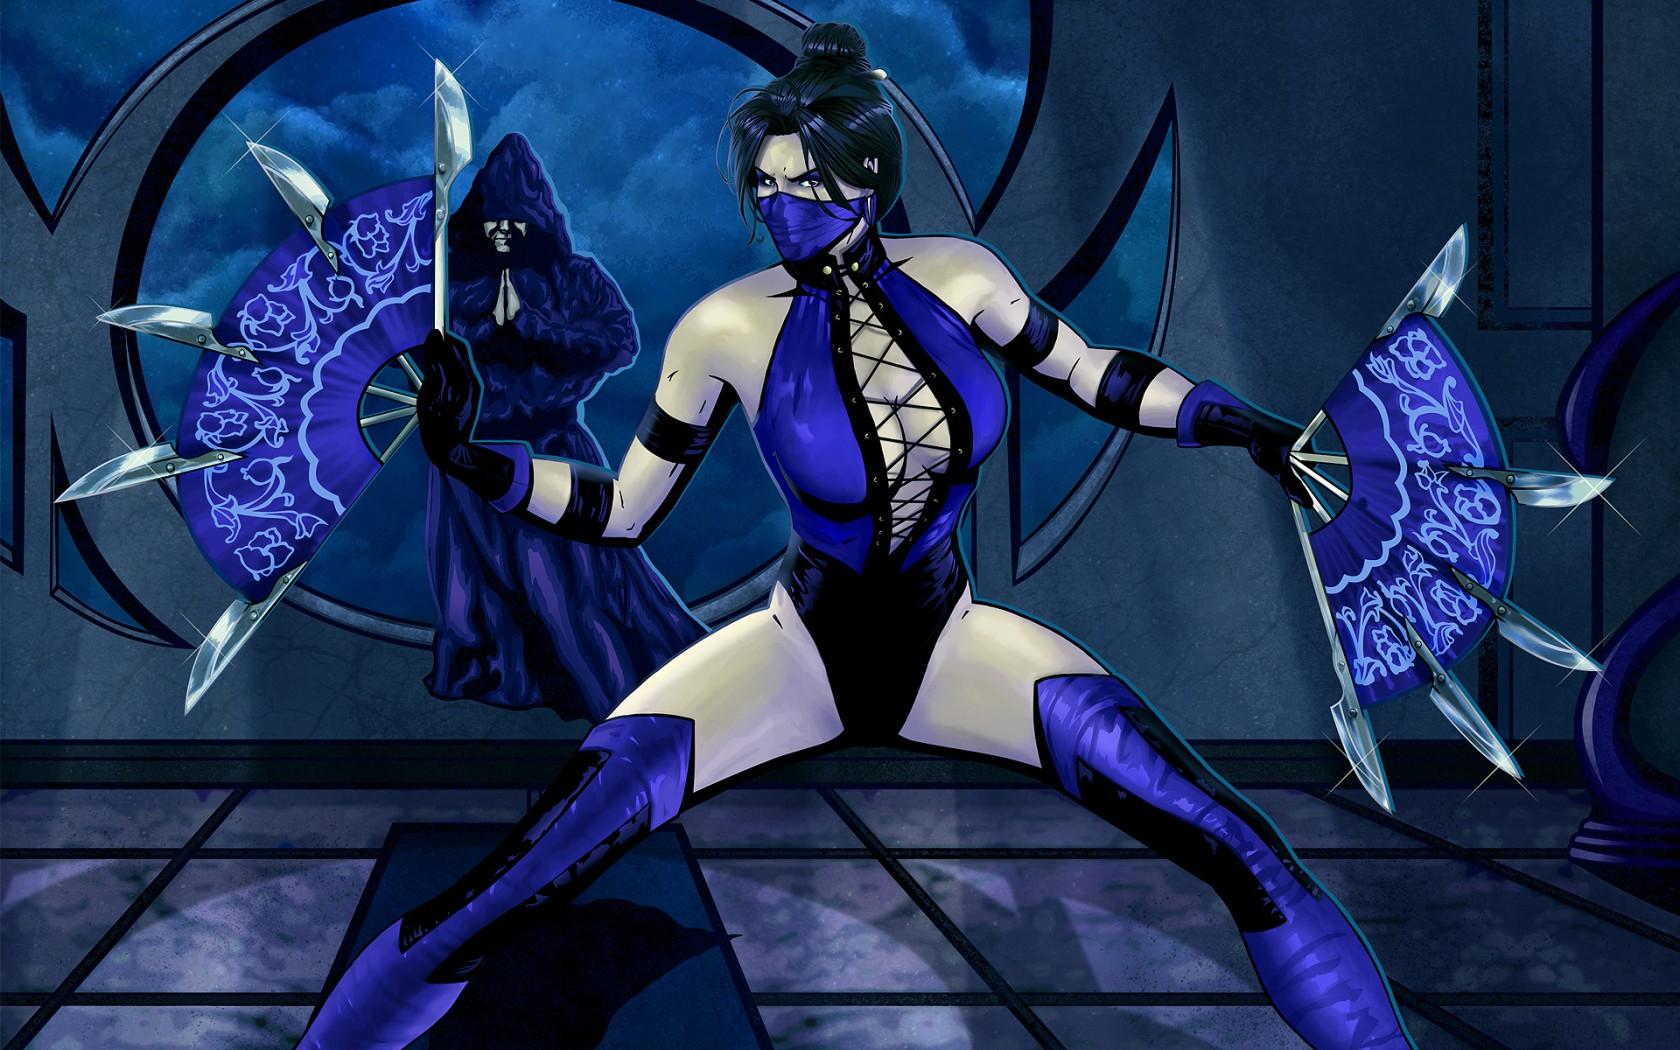 Mortal Kombat Wallpaper Kitana 2 Mortal Kombat Games Fan Site